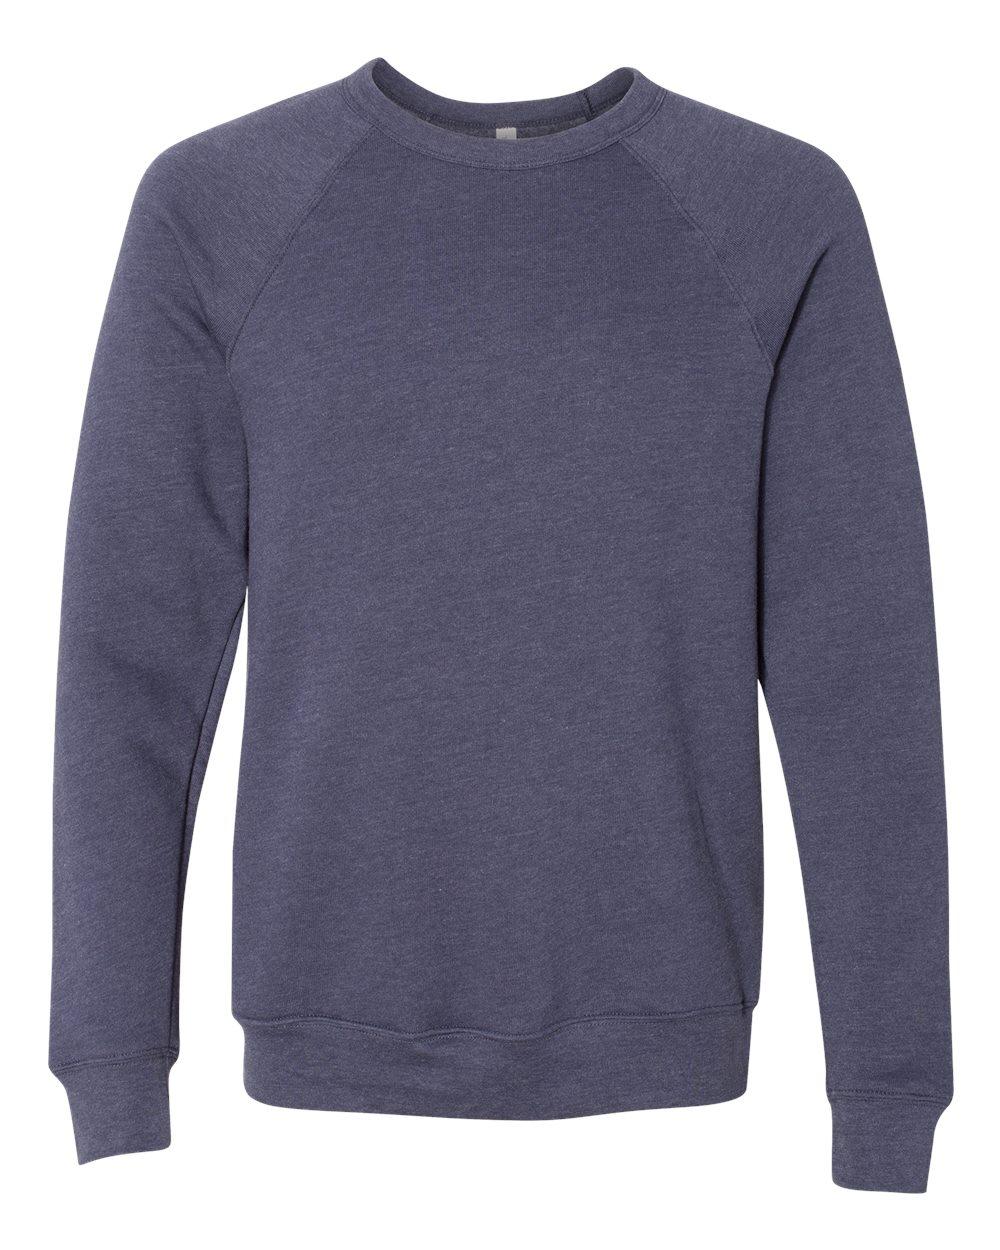 Bella-Canvas-Unisex-Sponge-Fleece-Crewneck-Sweatshirt-Top-Blank-3901-up-to-2XL thumbnail 40